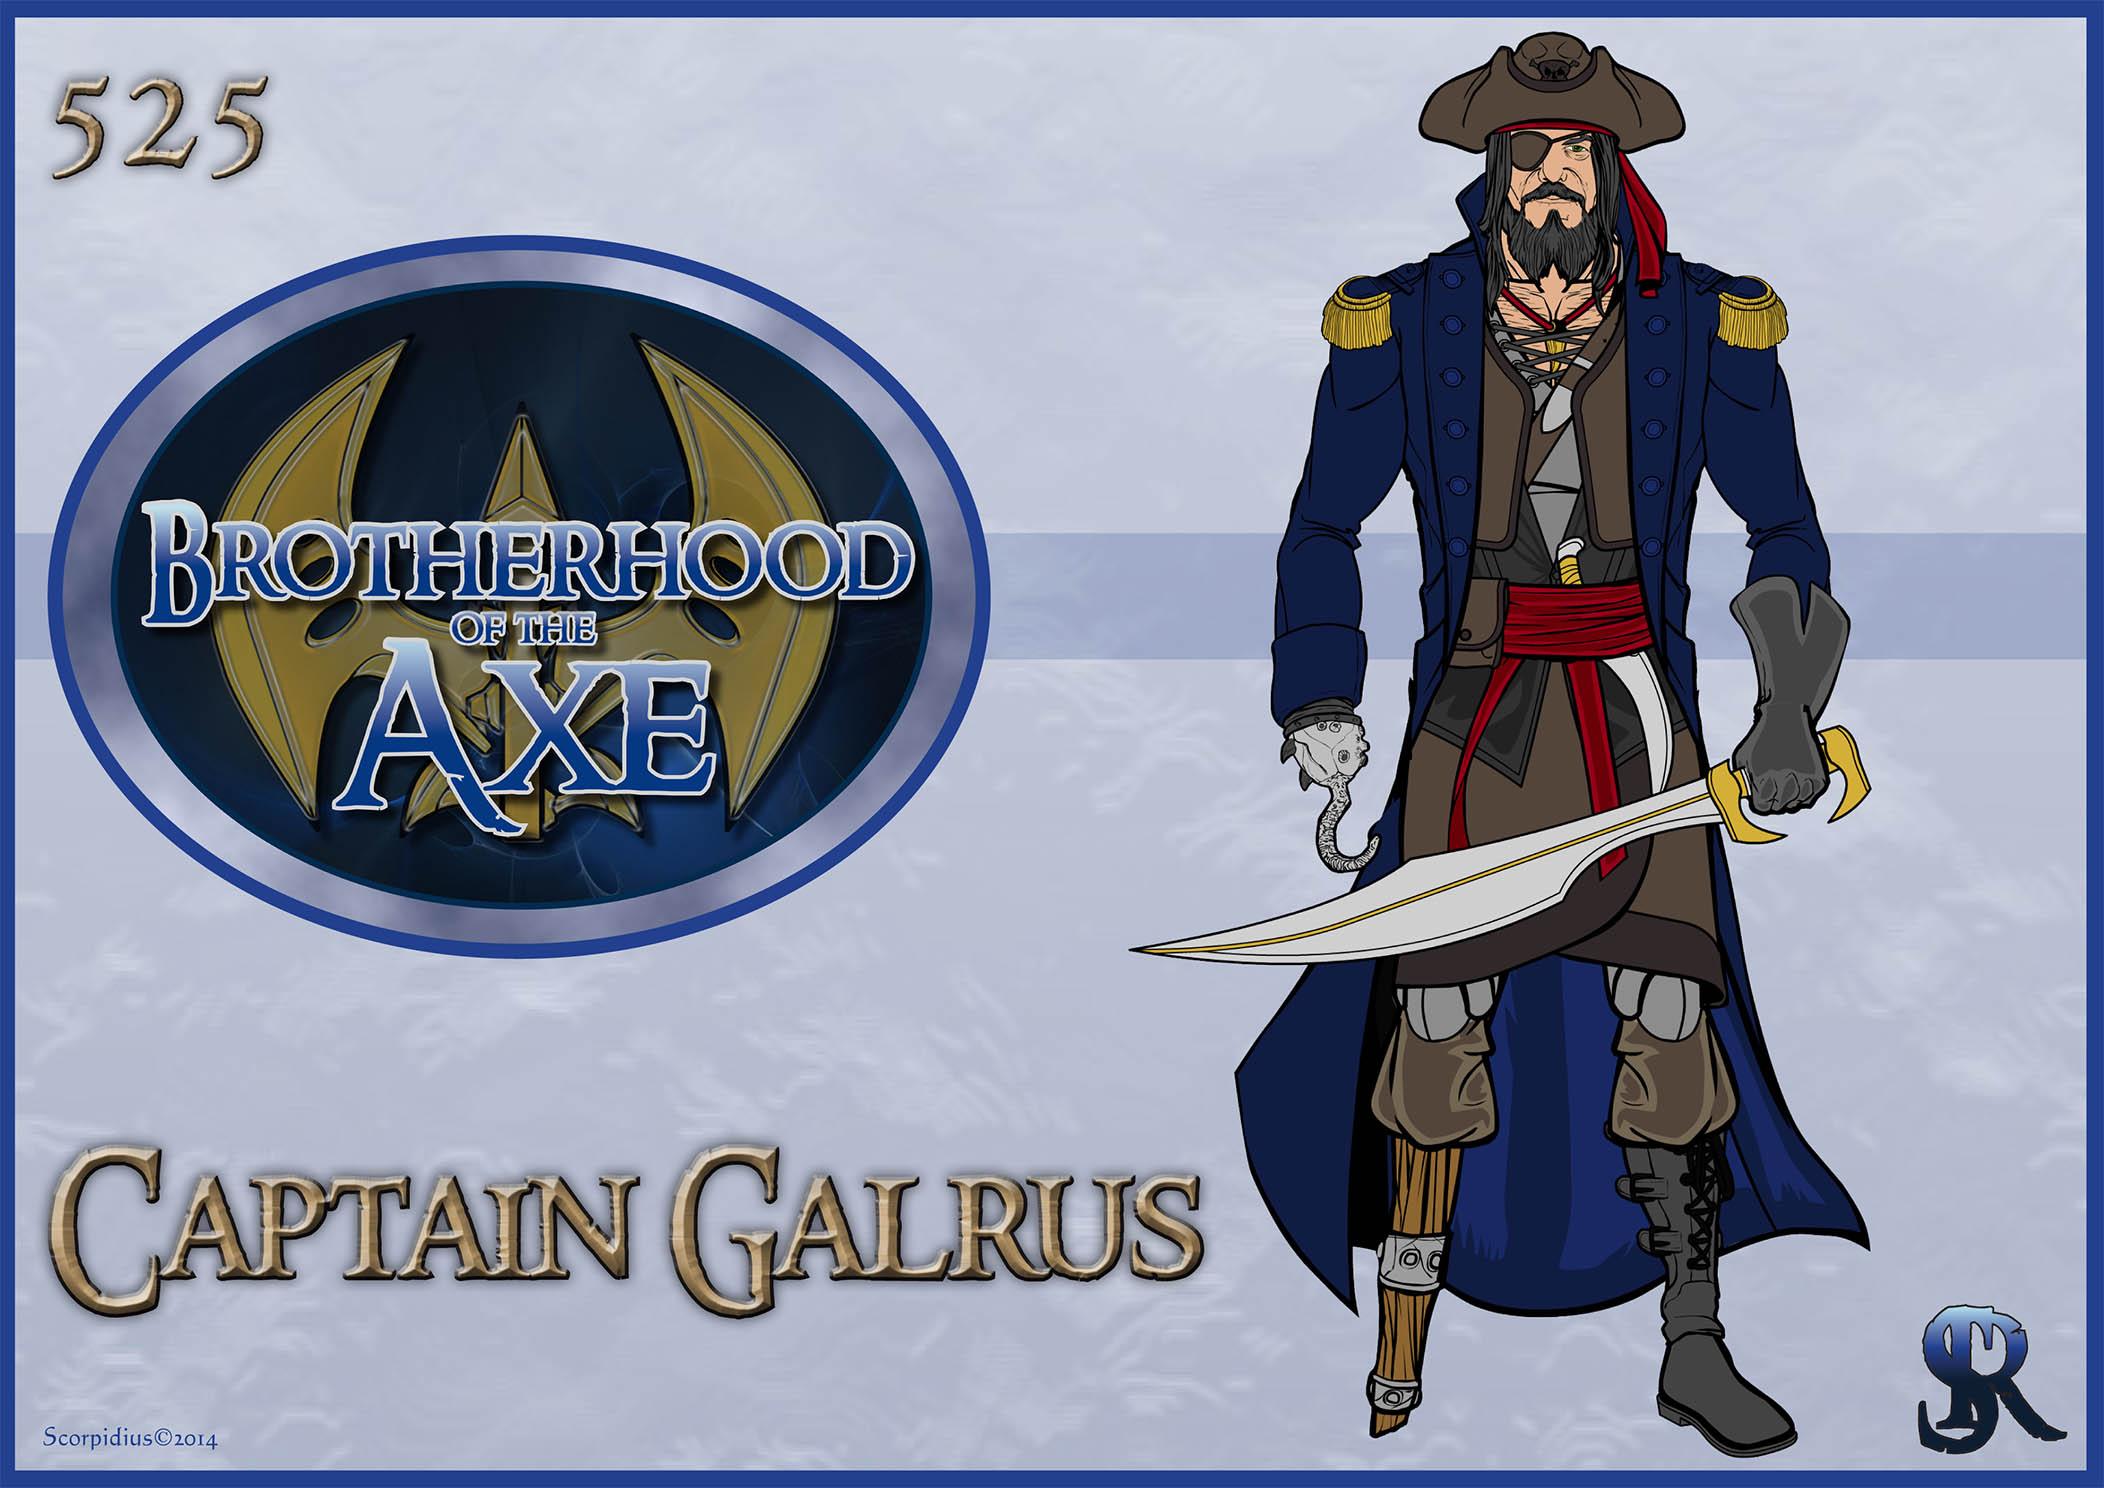 http://www.heromachine.com/wp-content/legacy/forum-image-uploads/scorpidius/2014/07/525-Captain-Galrus.jpg